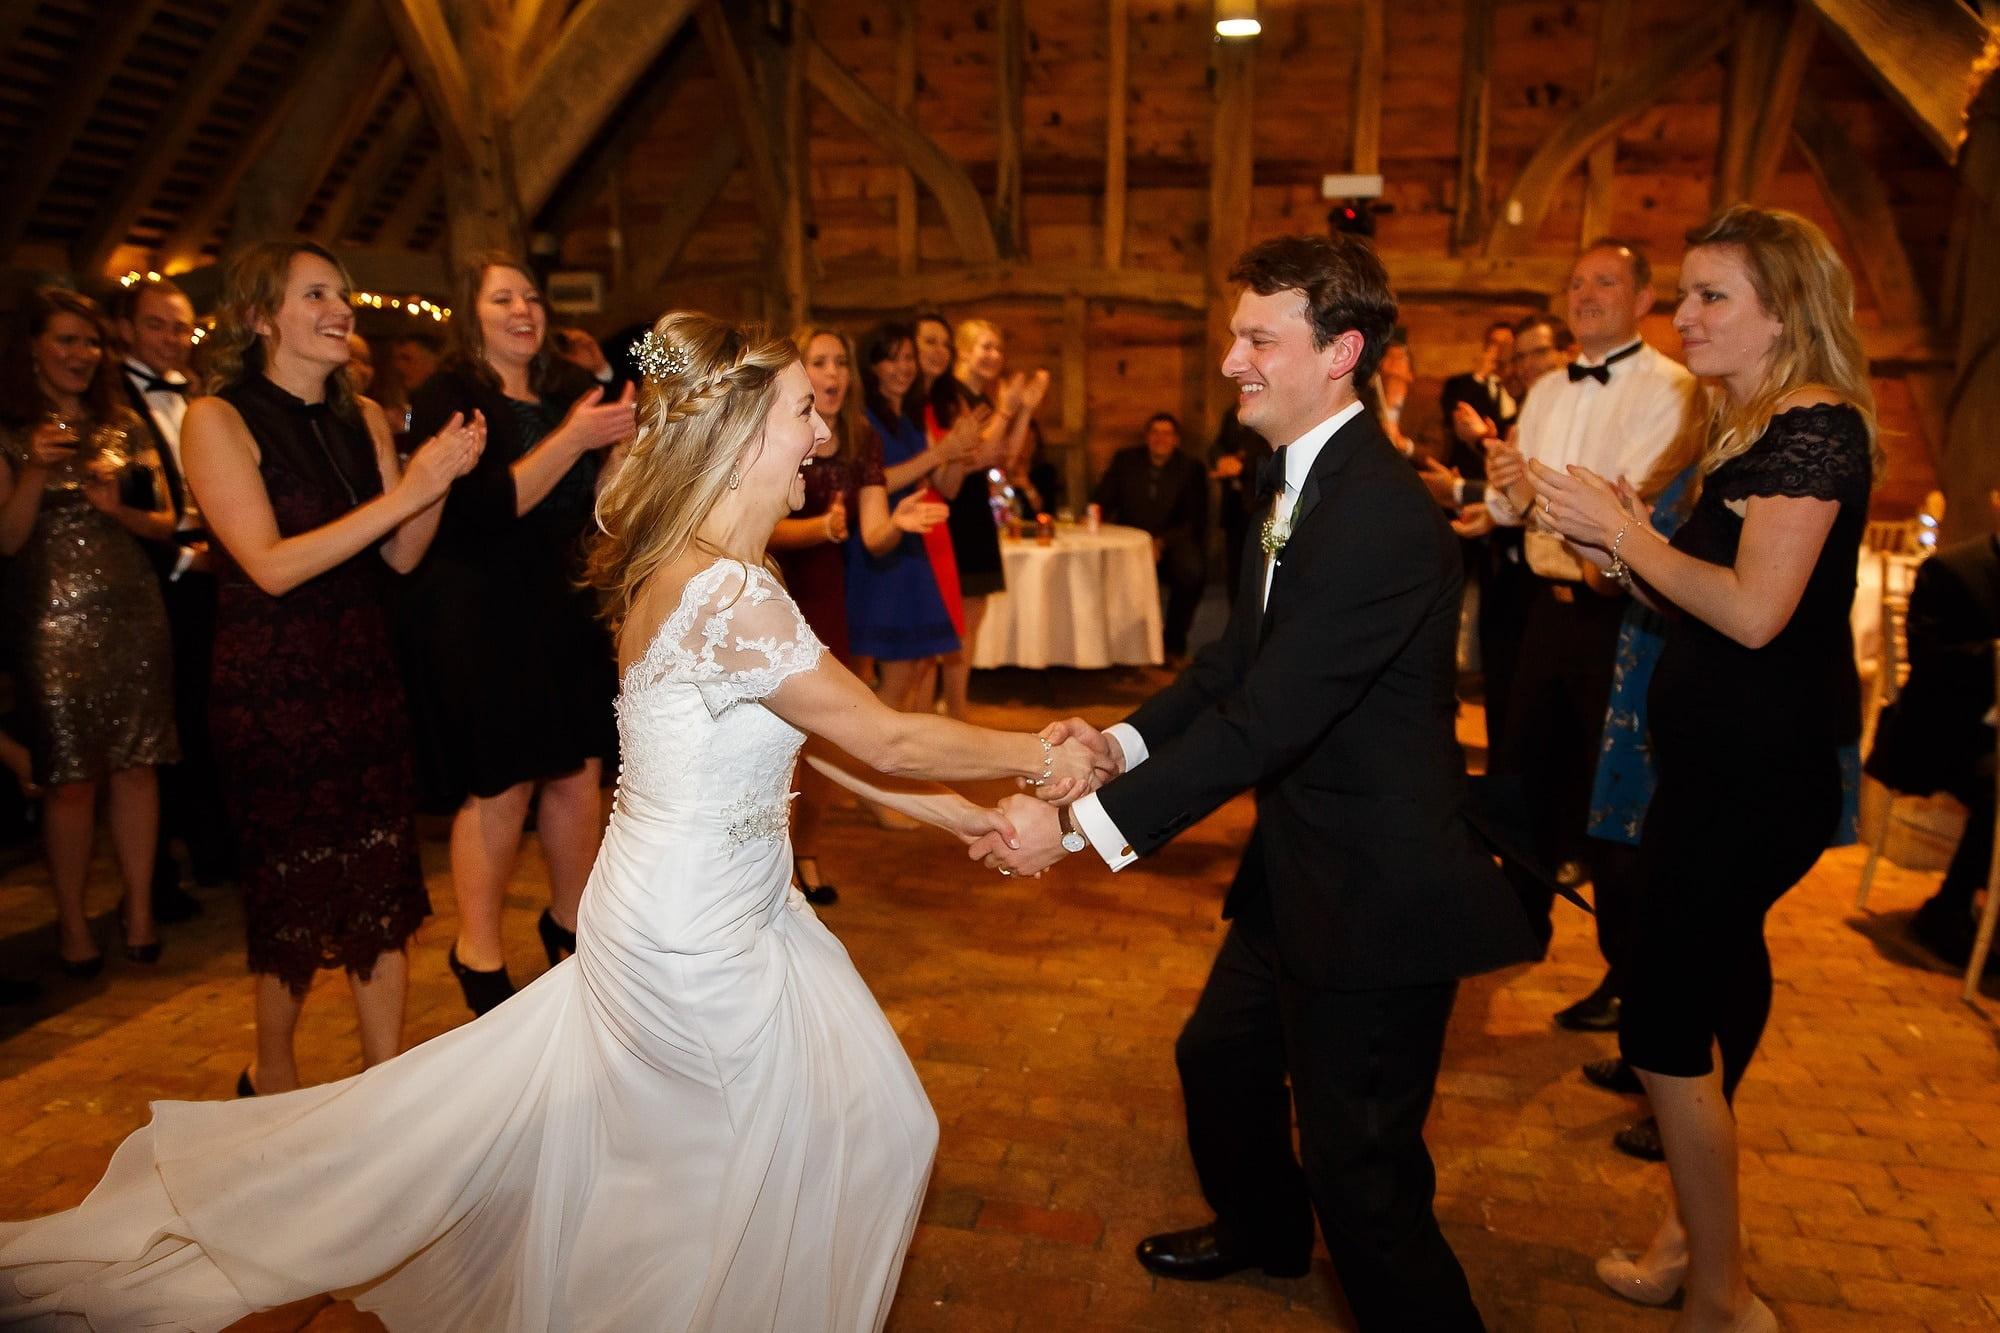 Surrey wedding photography couple dancing Gildings Barn Chris Mann Photography